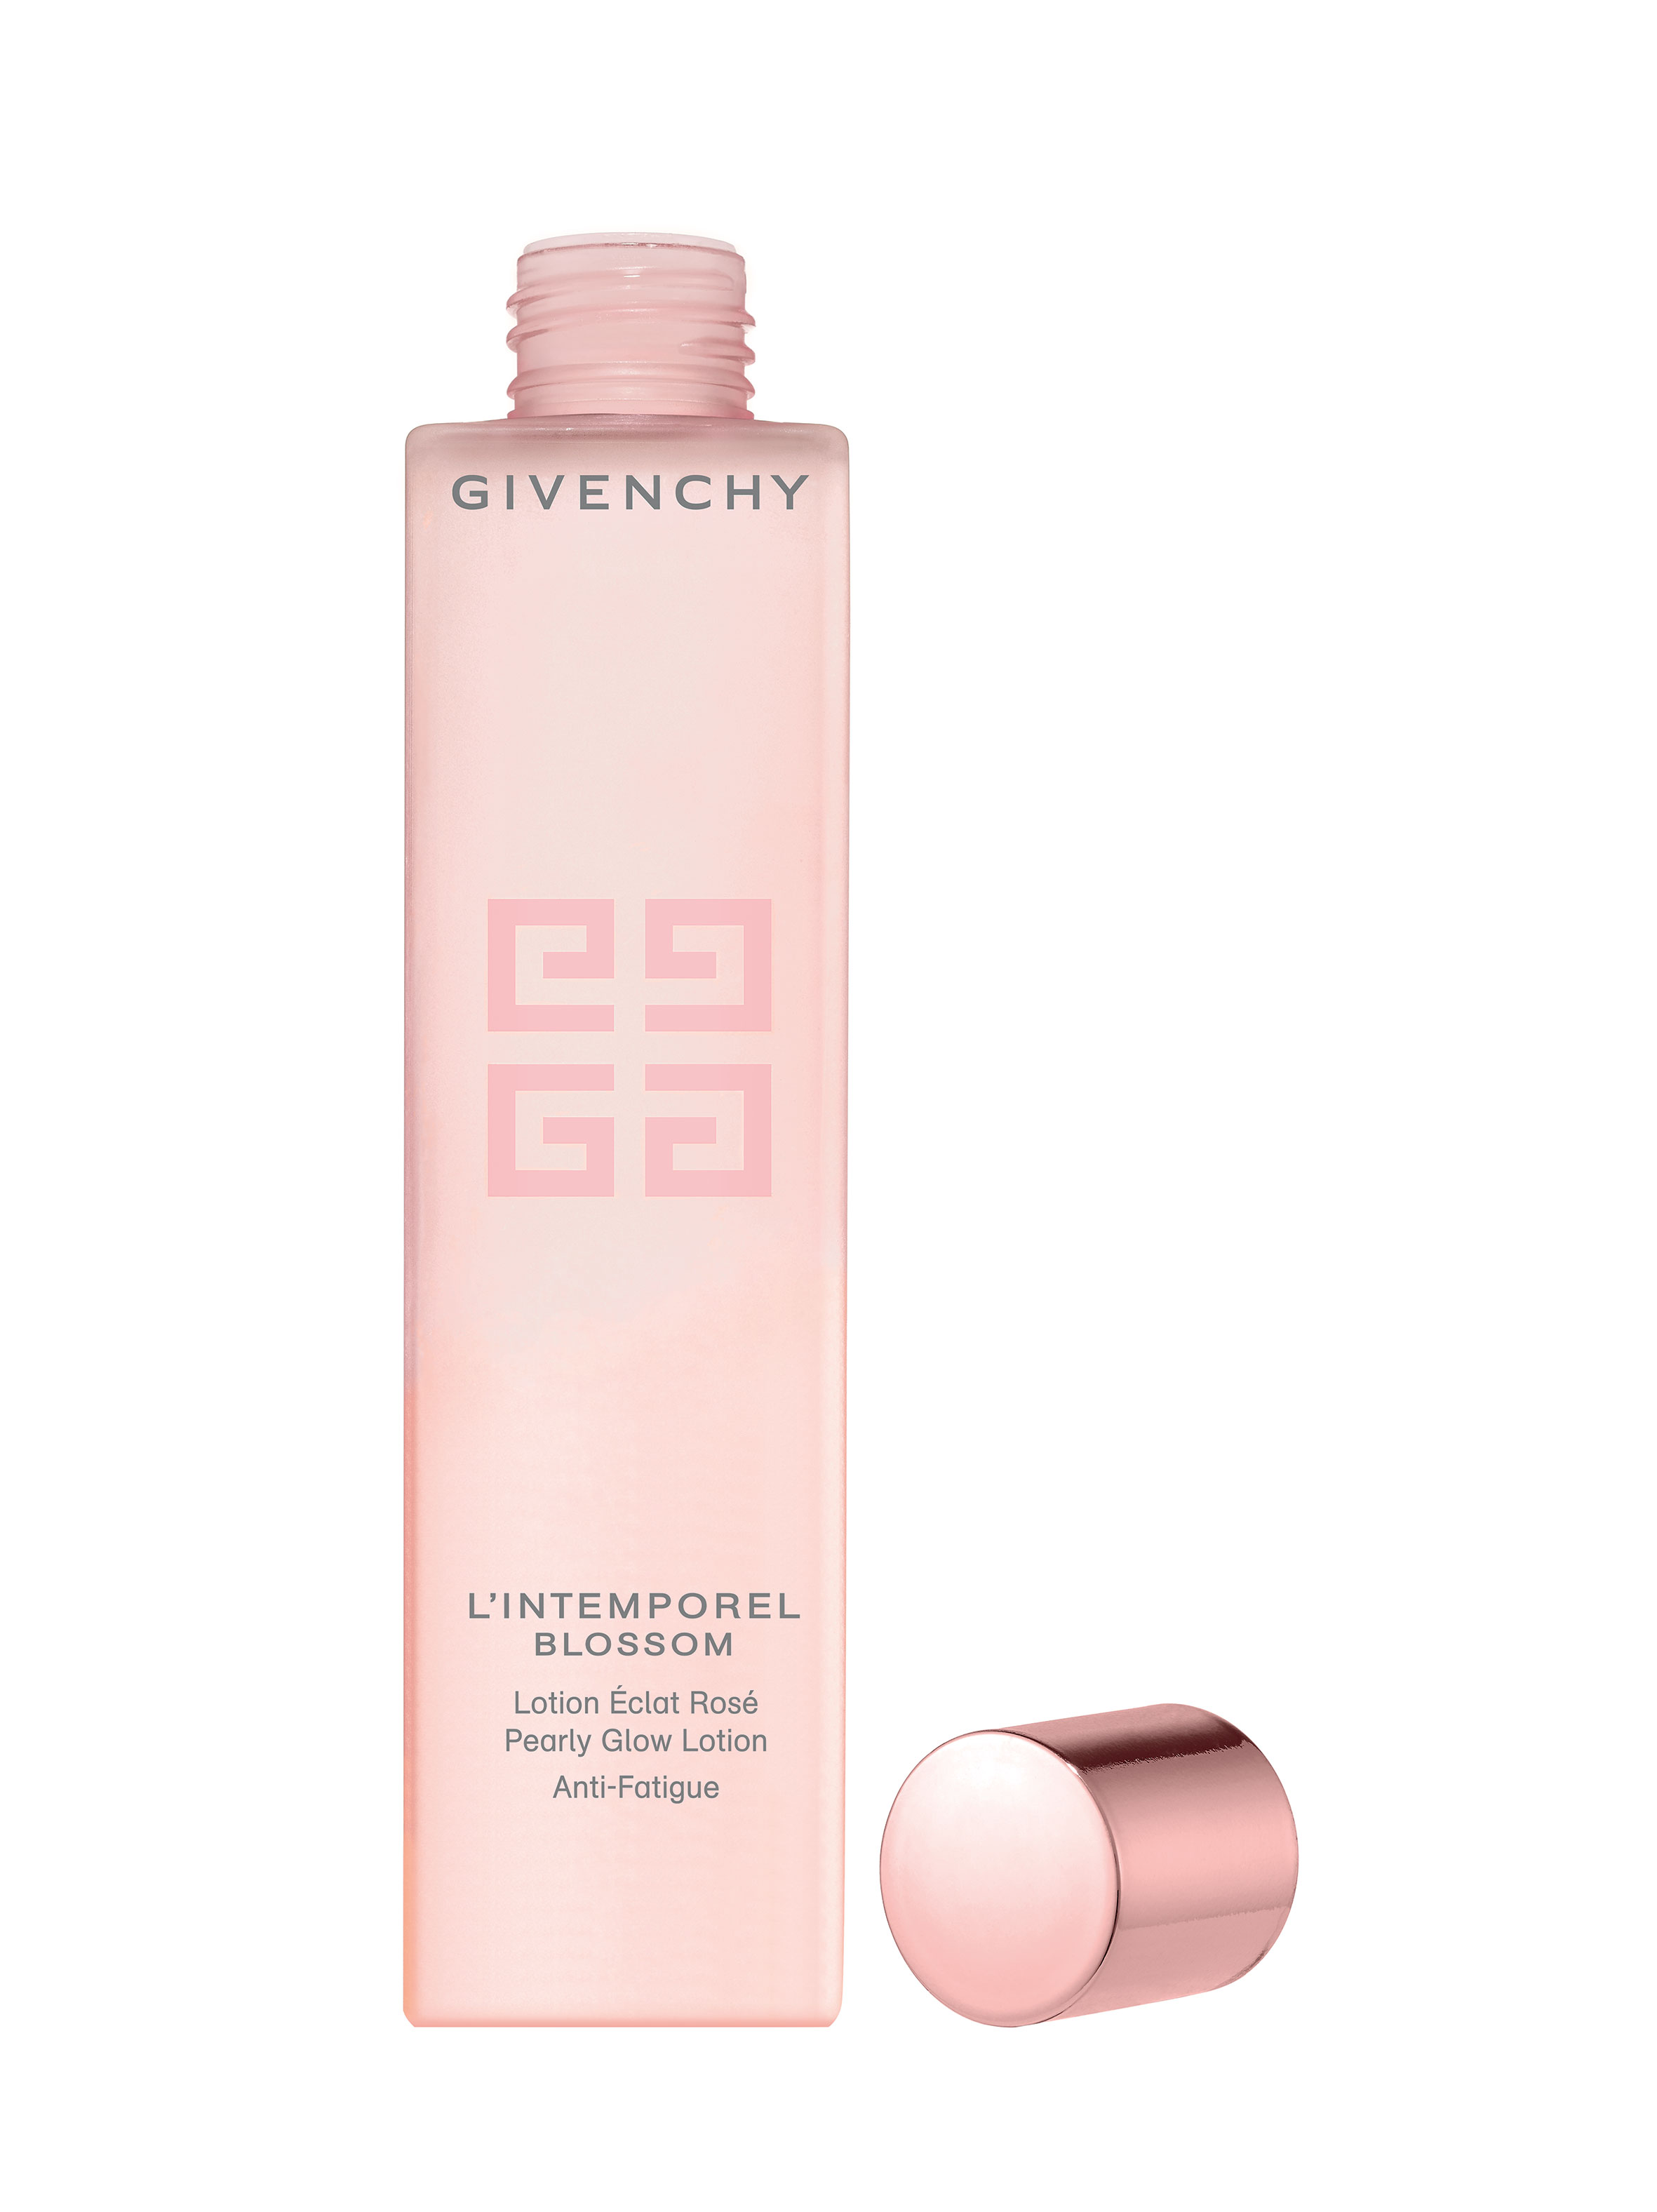 Intemporel Blossom Givenchy Zeyna